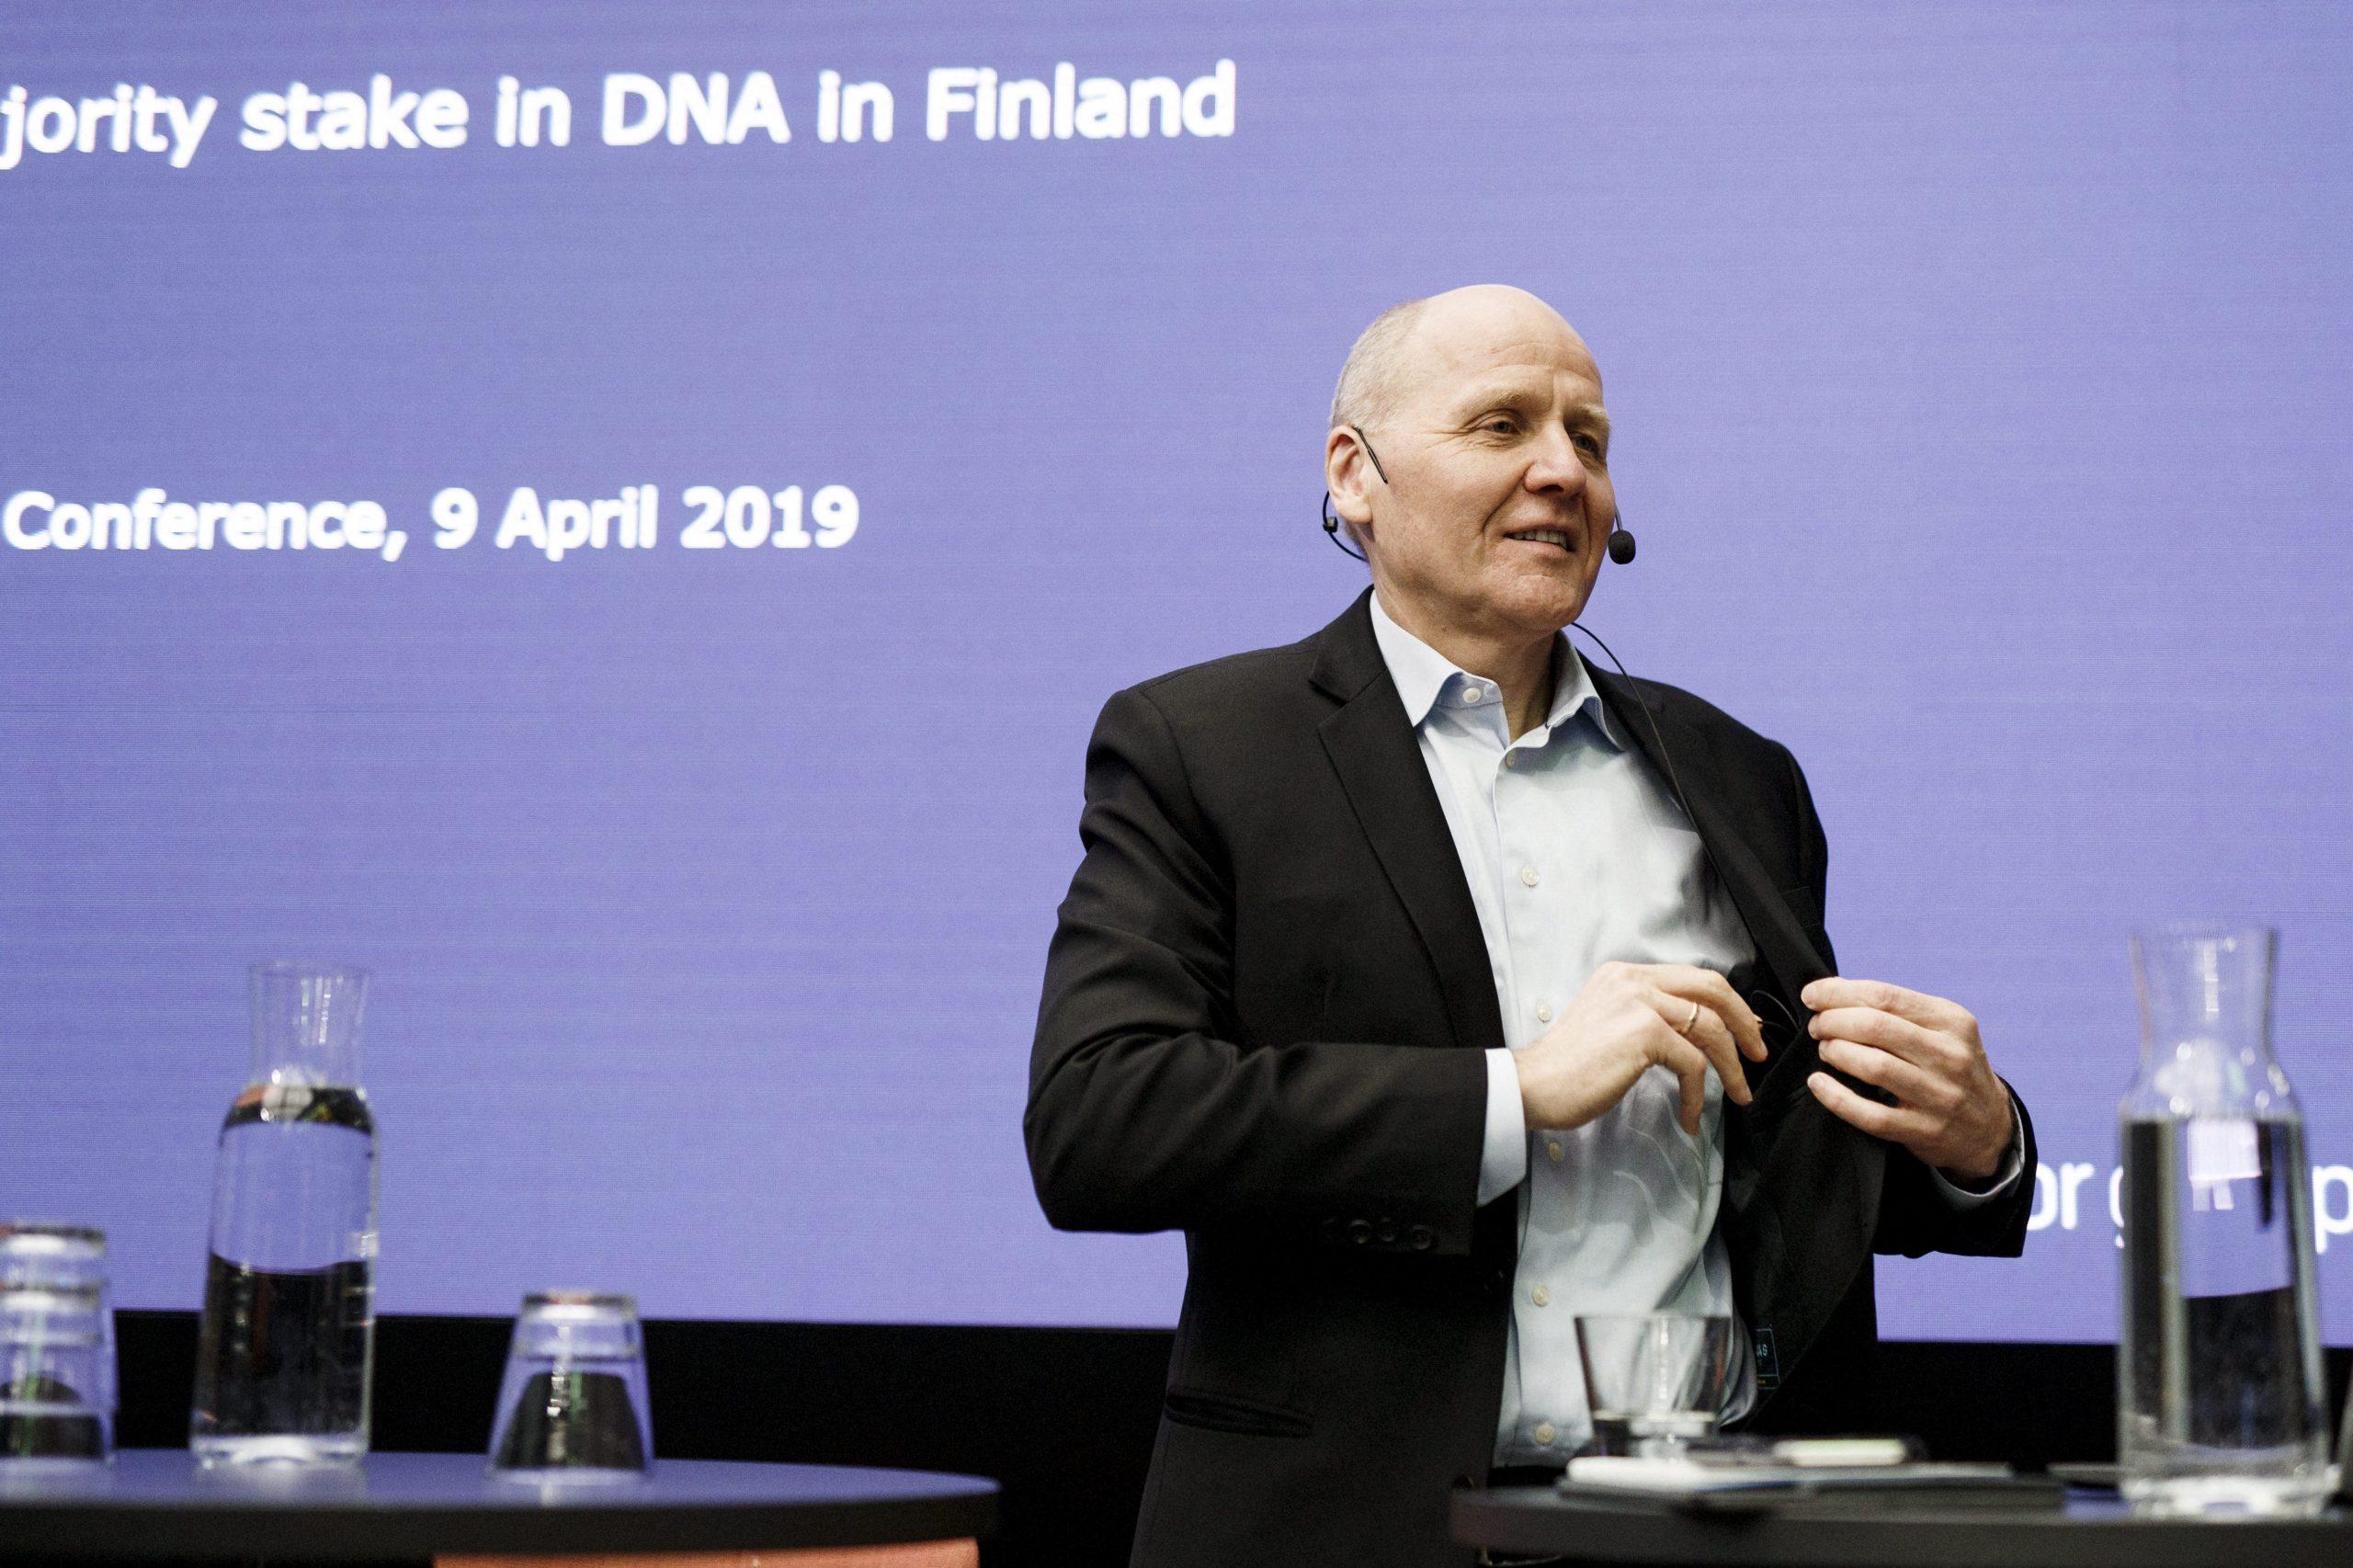 Mr Sigve Brekke, CEO of Telenor, talks at a press conference in April 2019. (AFP)